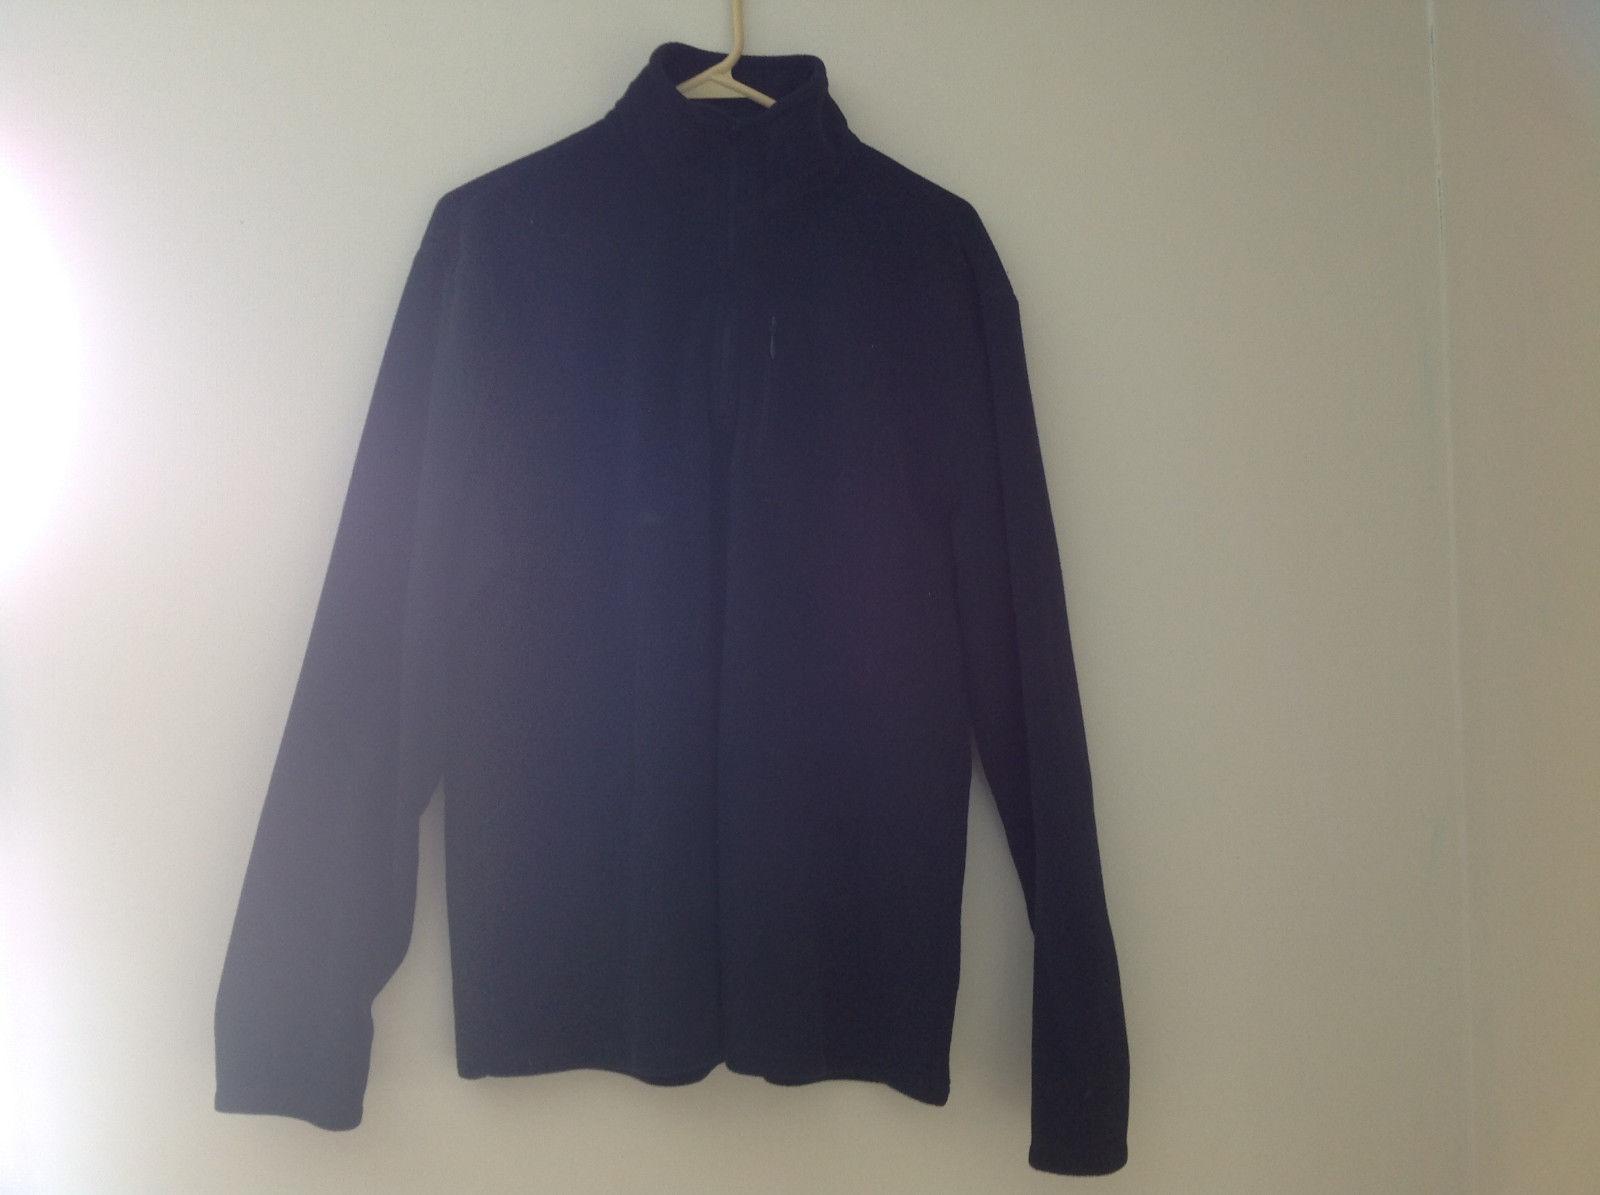 Aspen Black Long Sleeve Fleece Sweatshirt Zip Up Neck Size Large